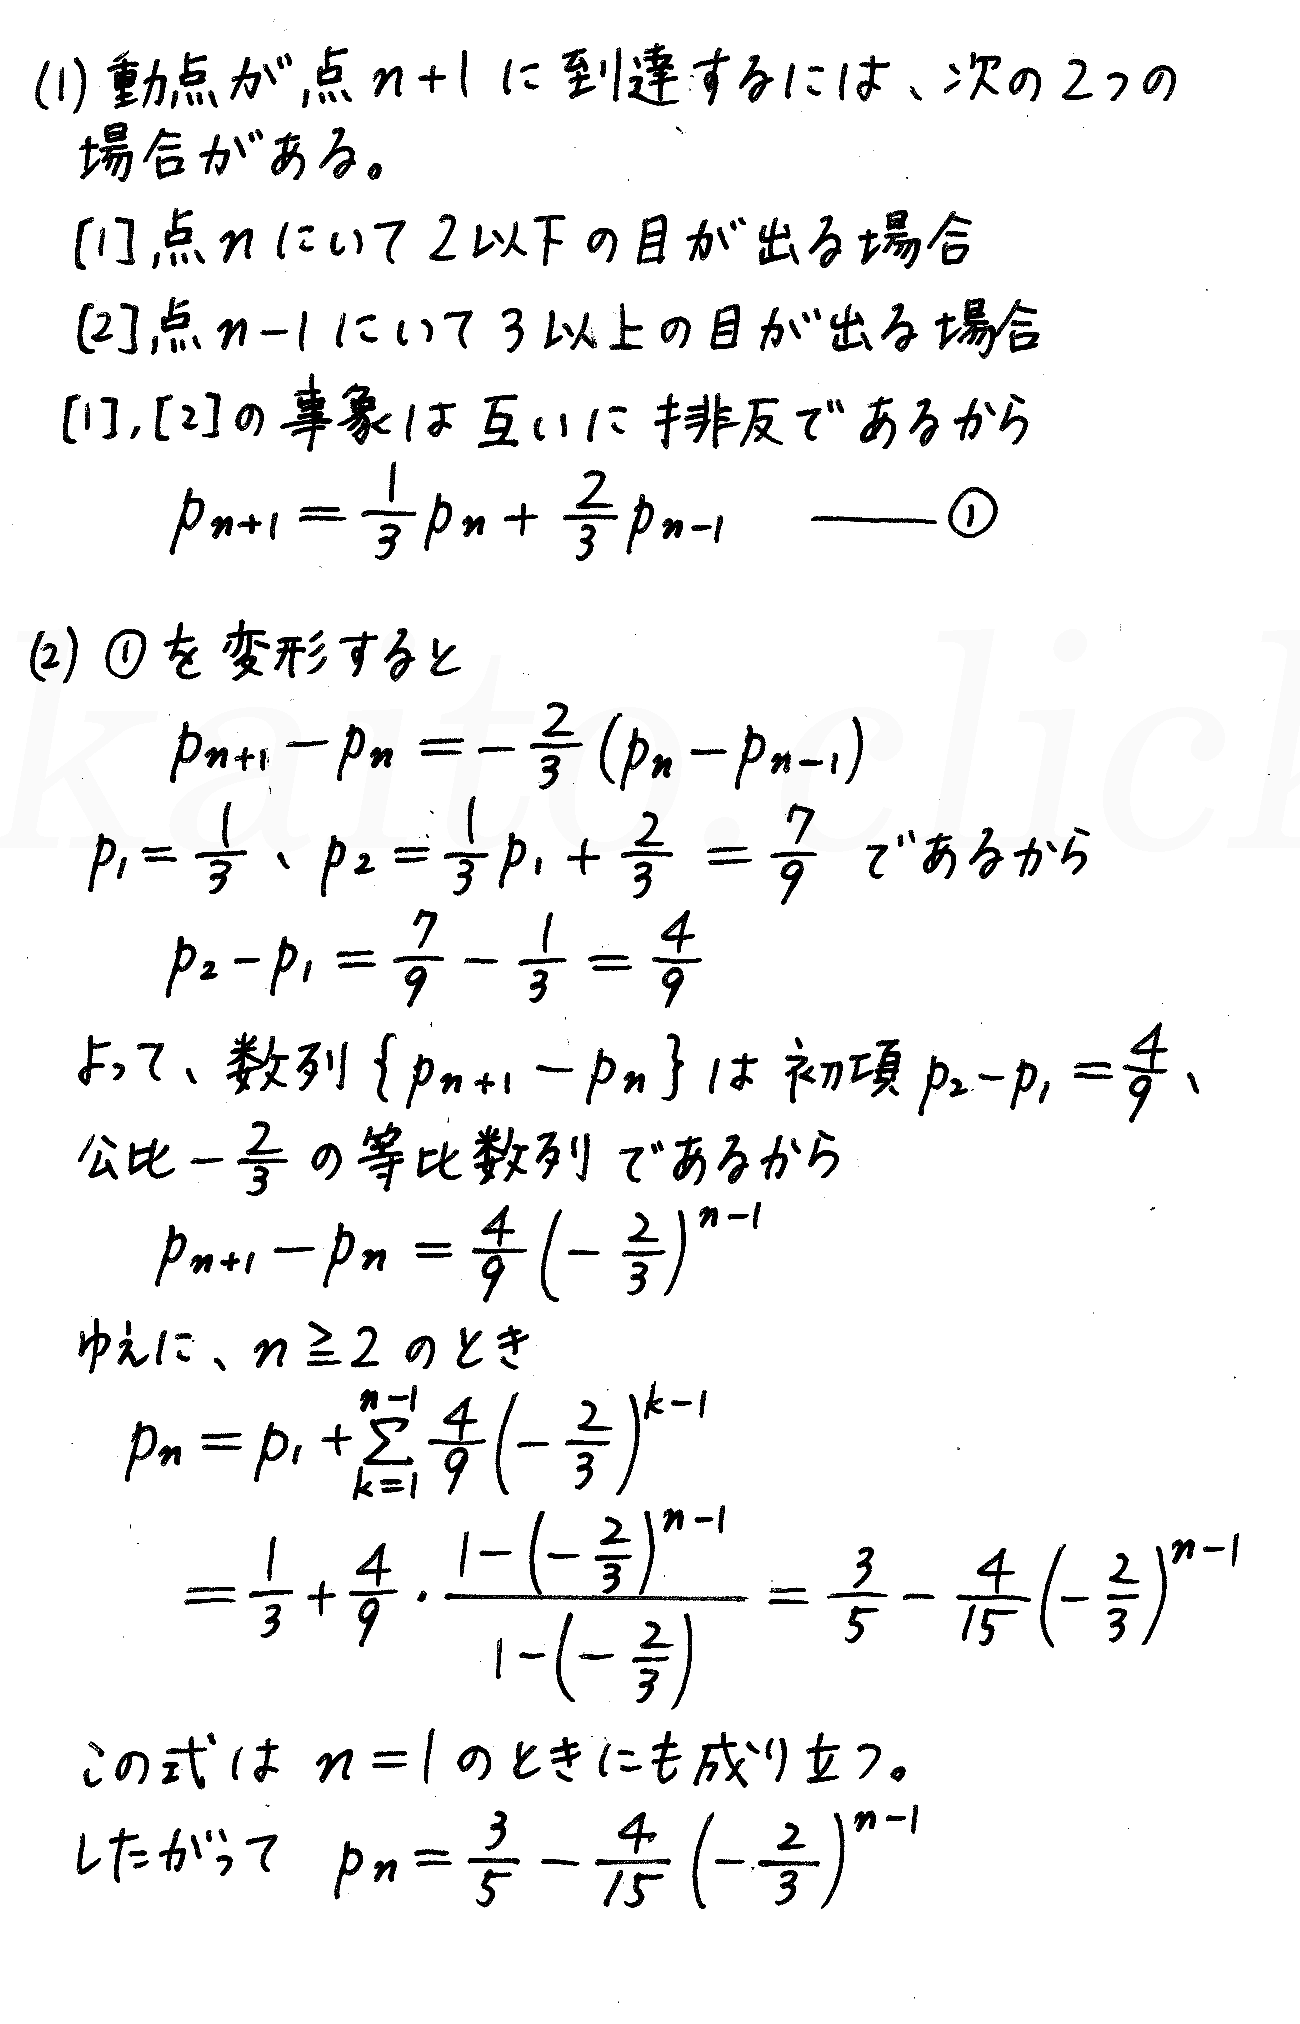 4STEP数学B-e26解答